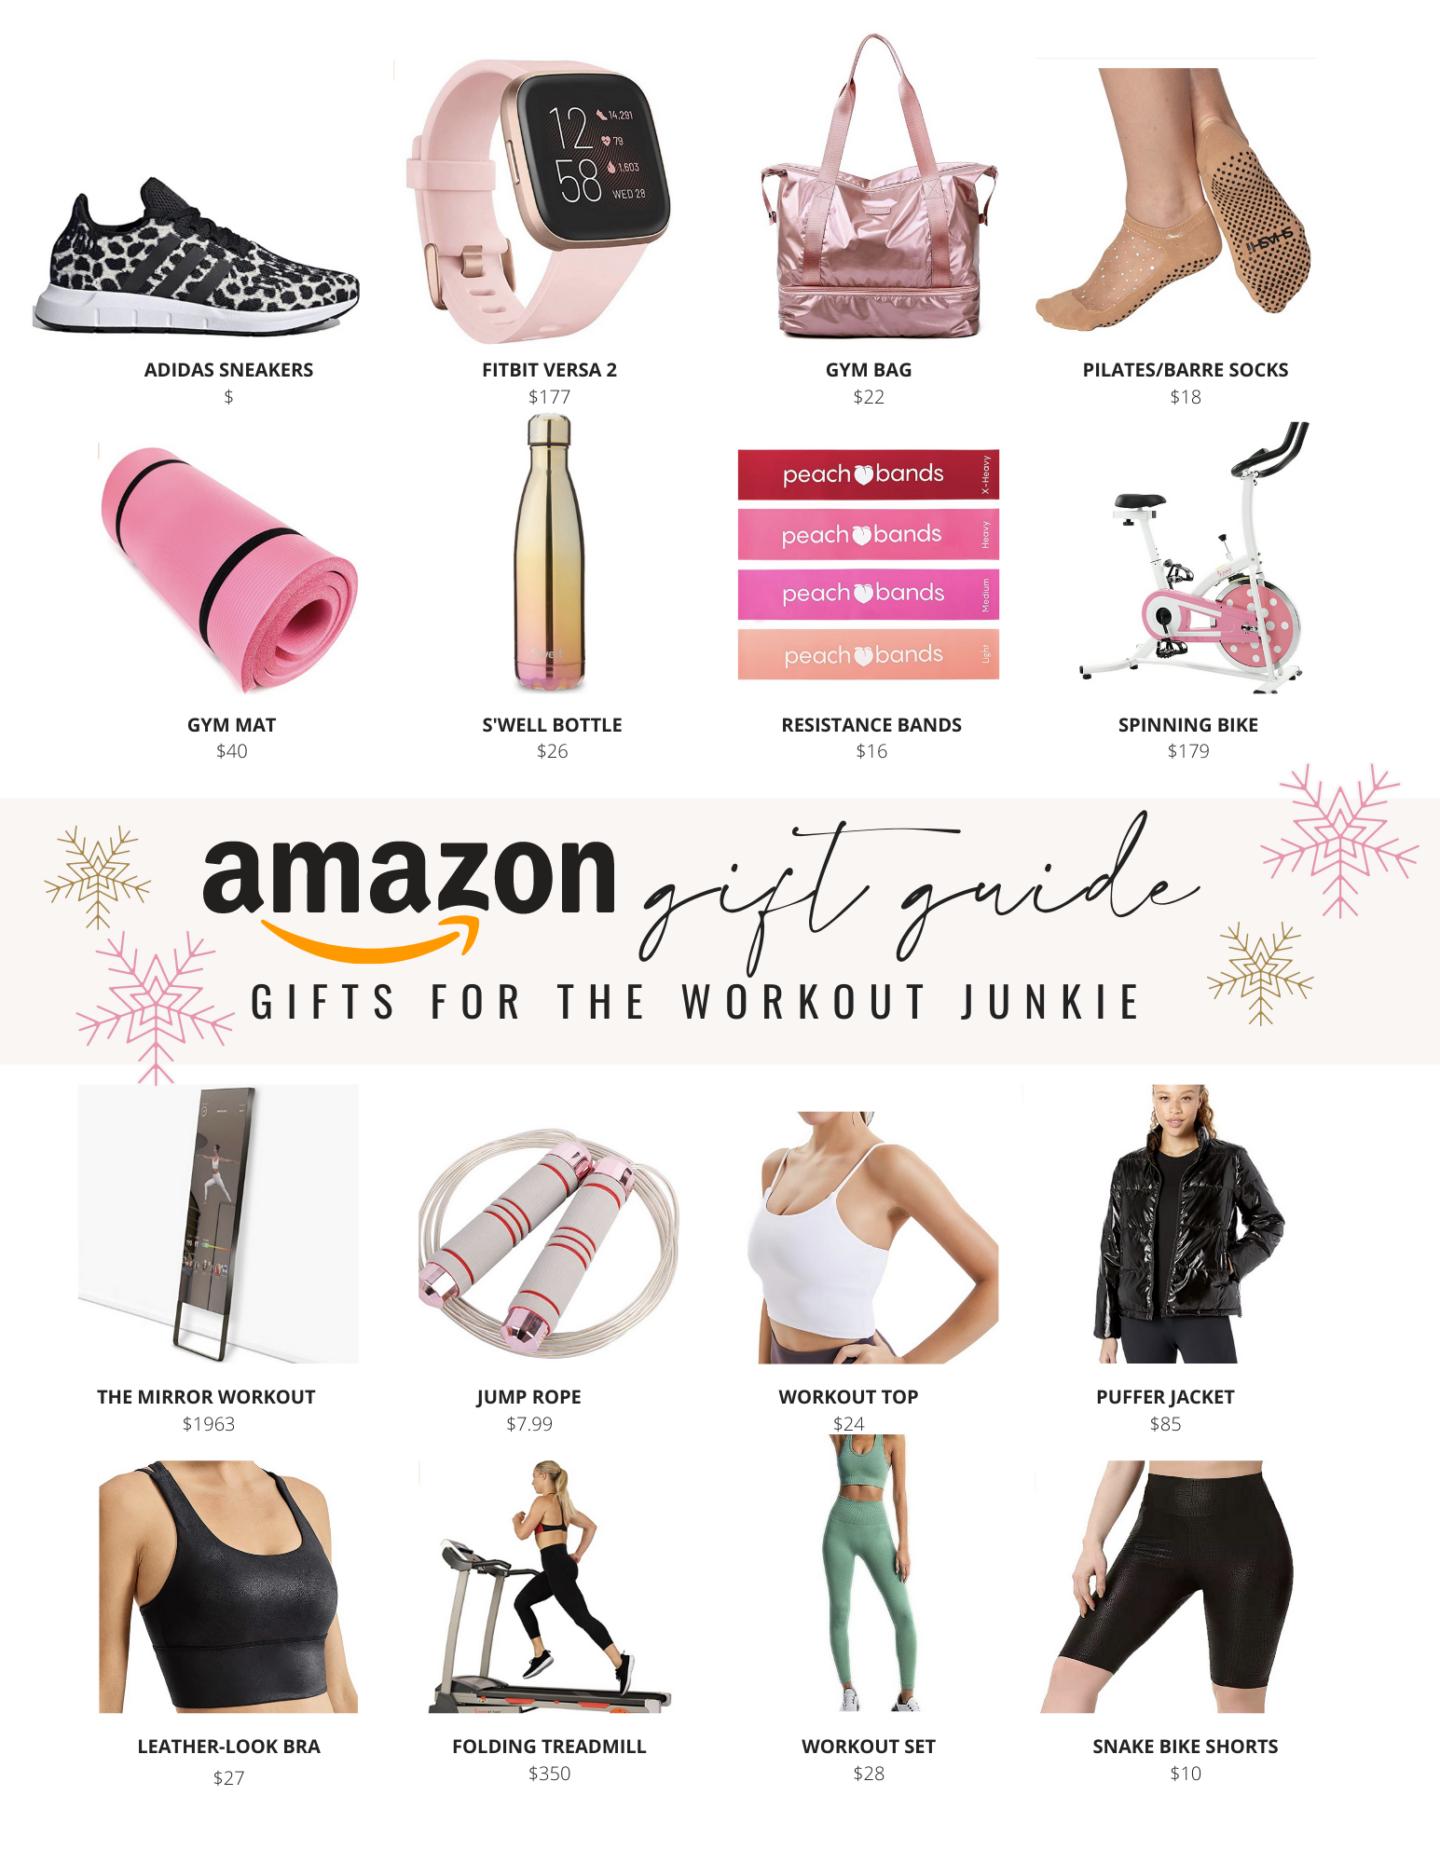 Amazon athletic gifts